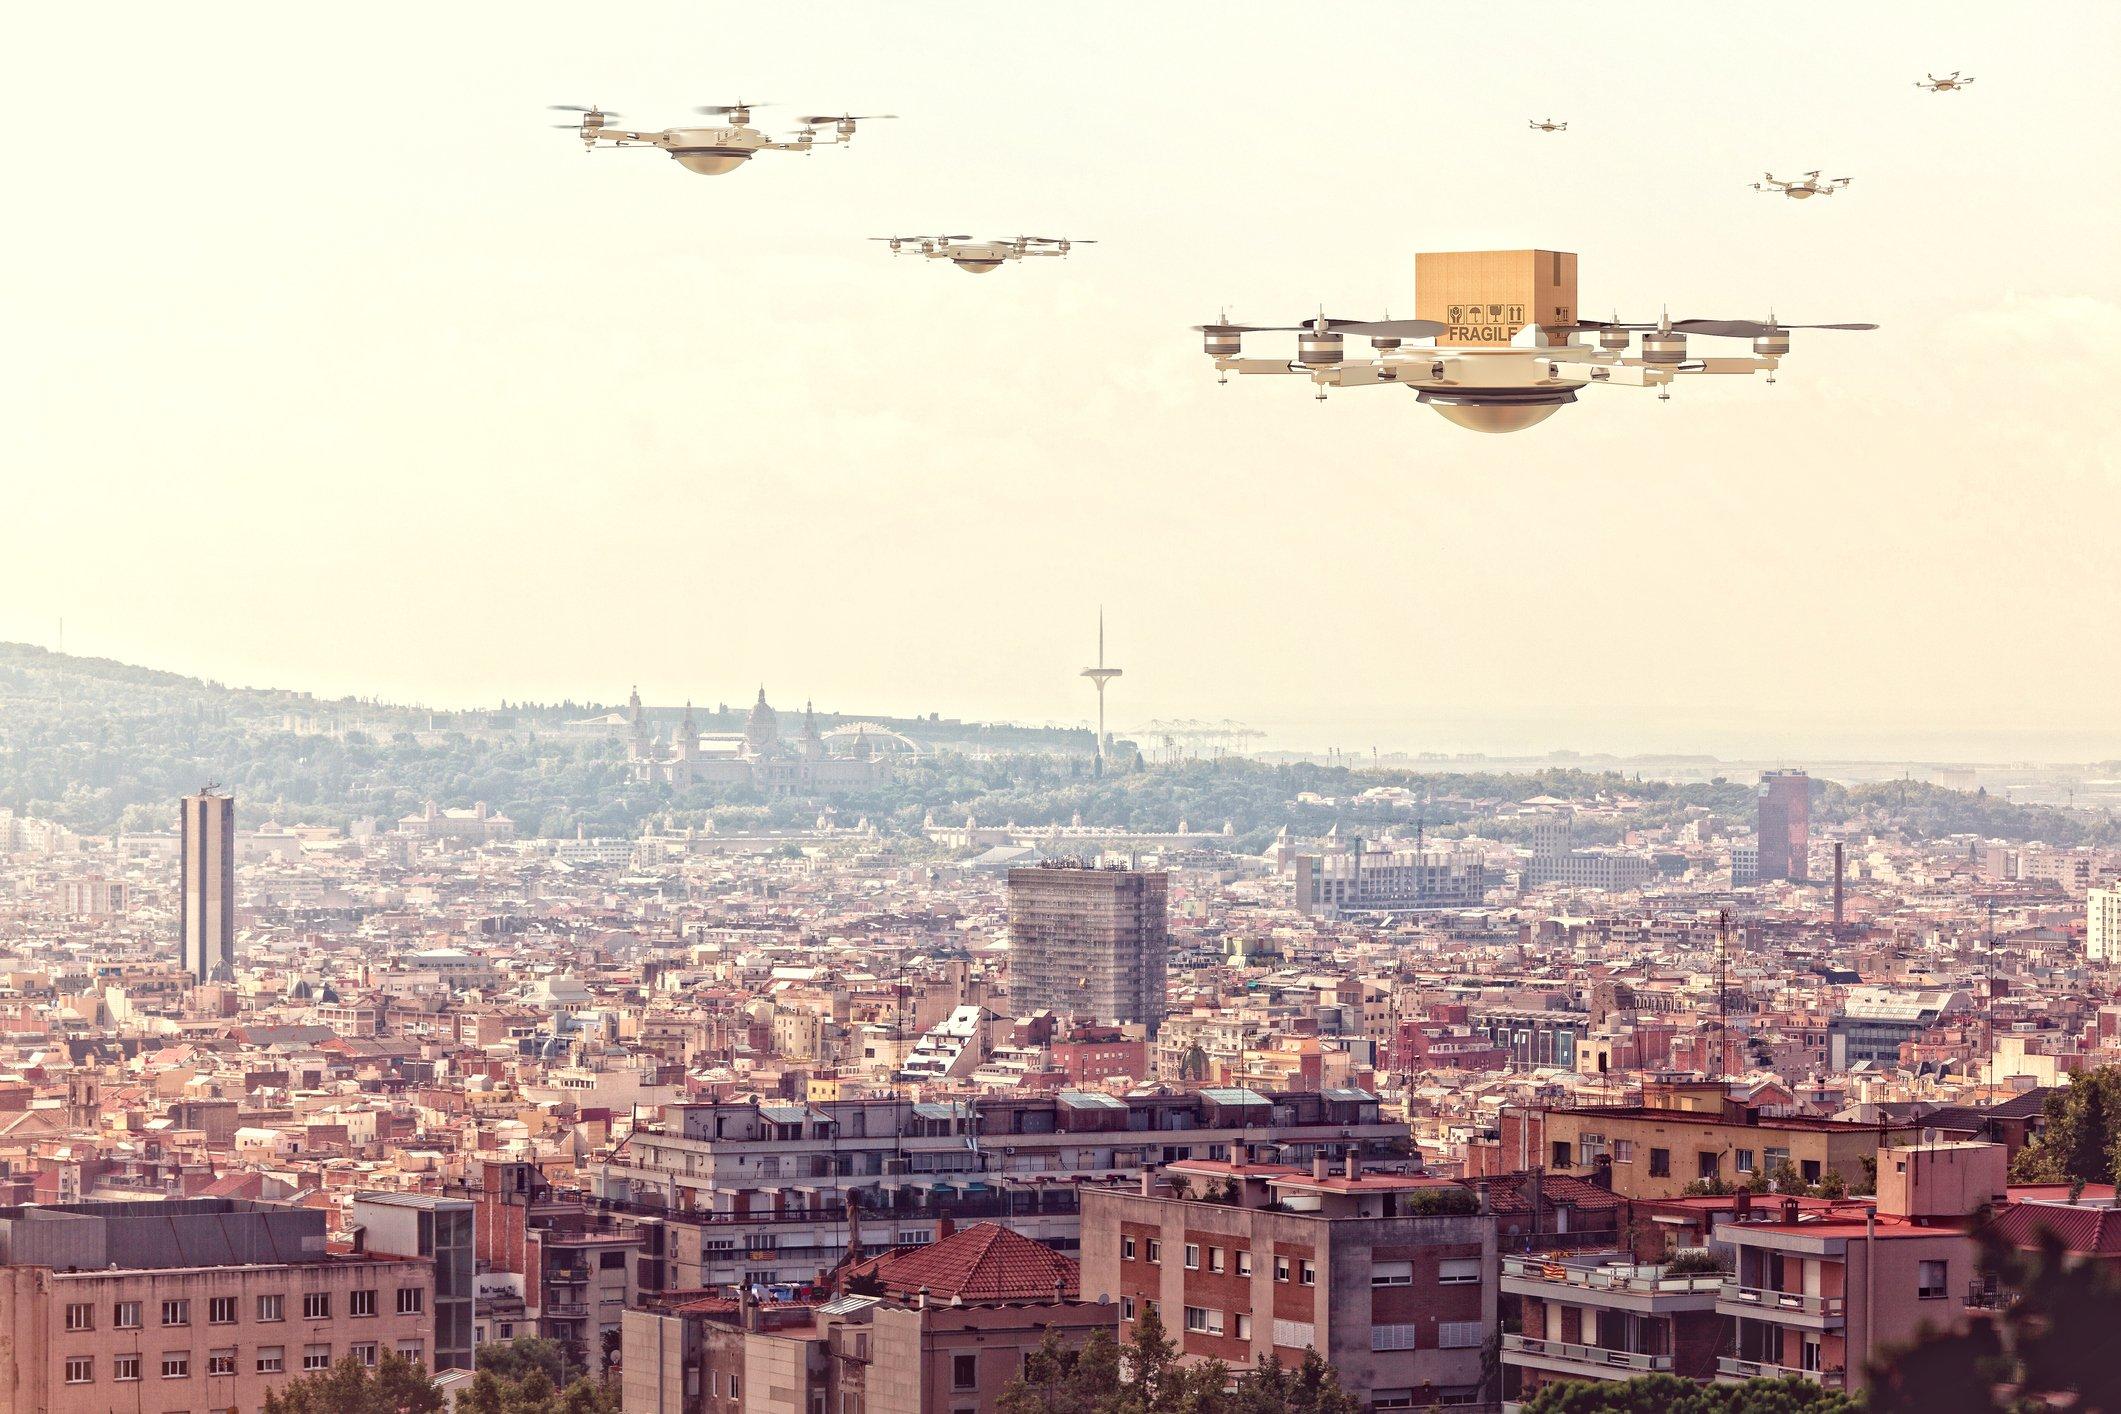 Drone delivery economics: are Amazon drones economically